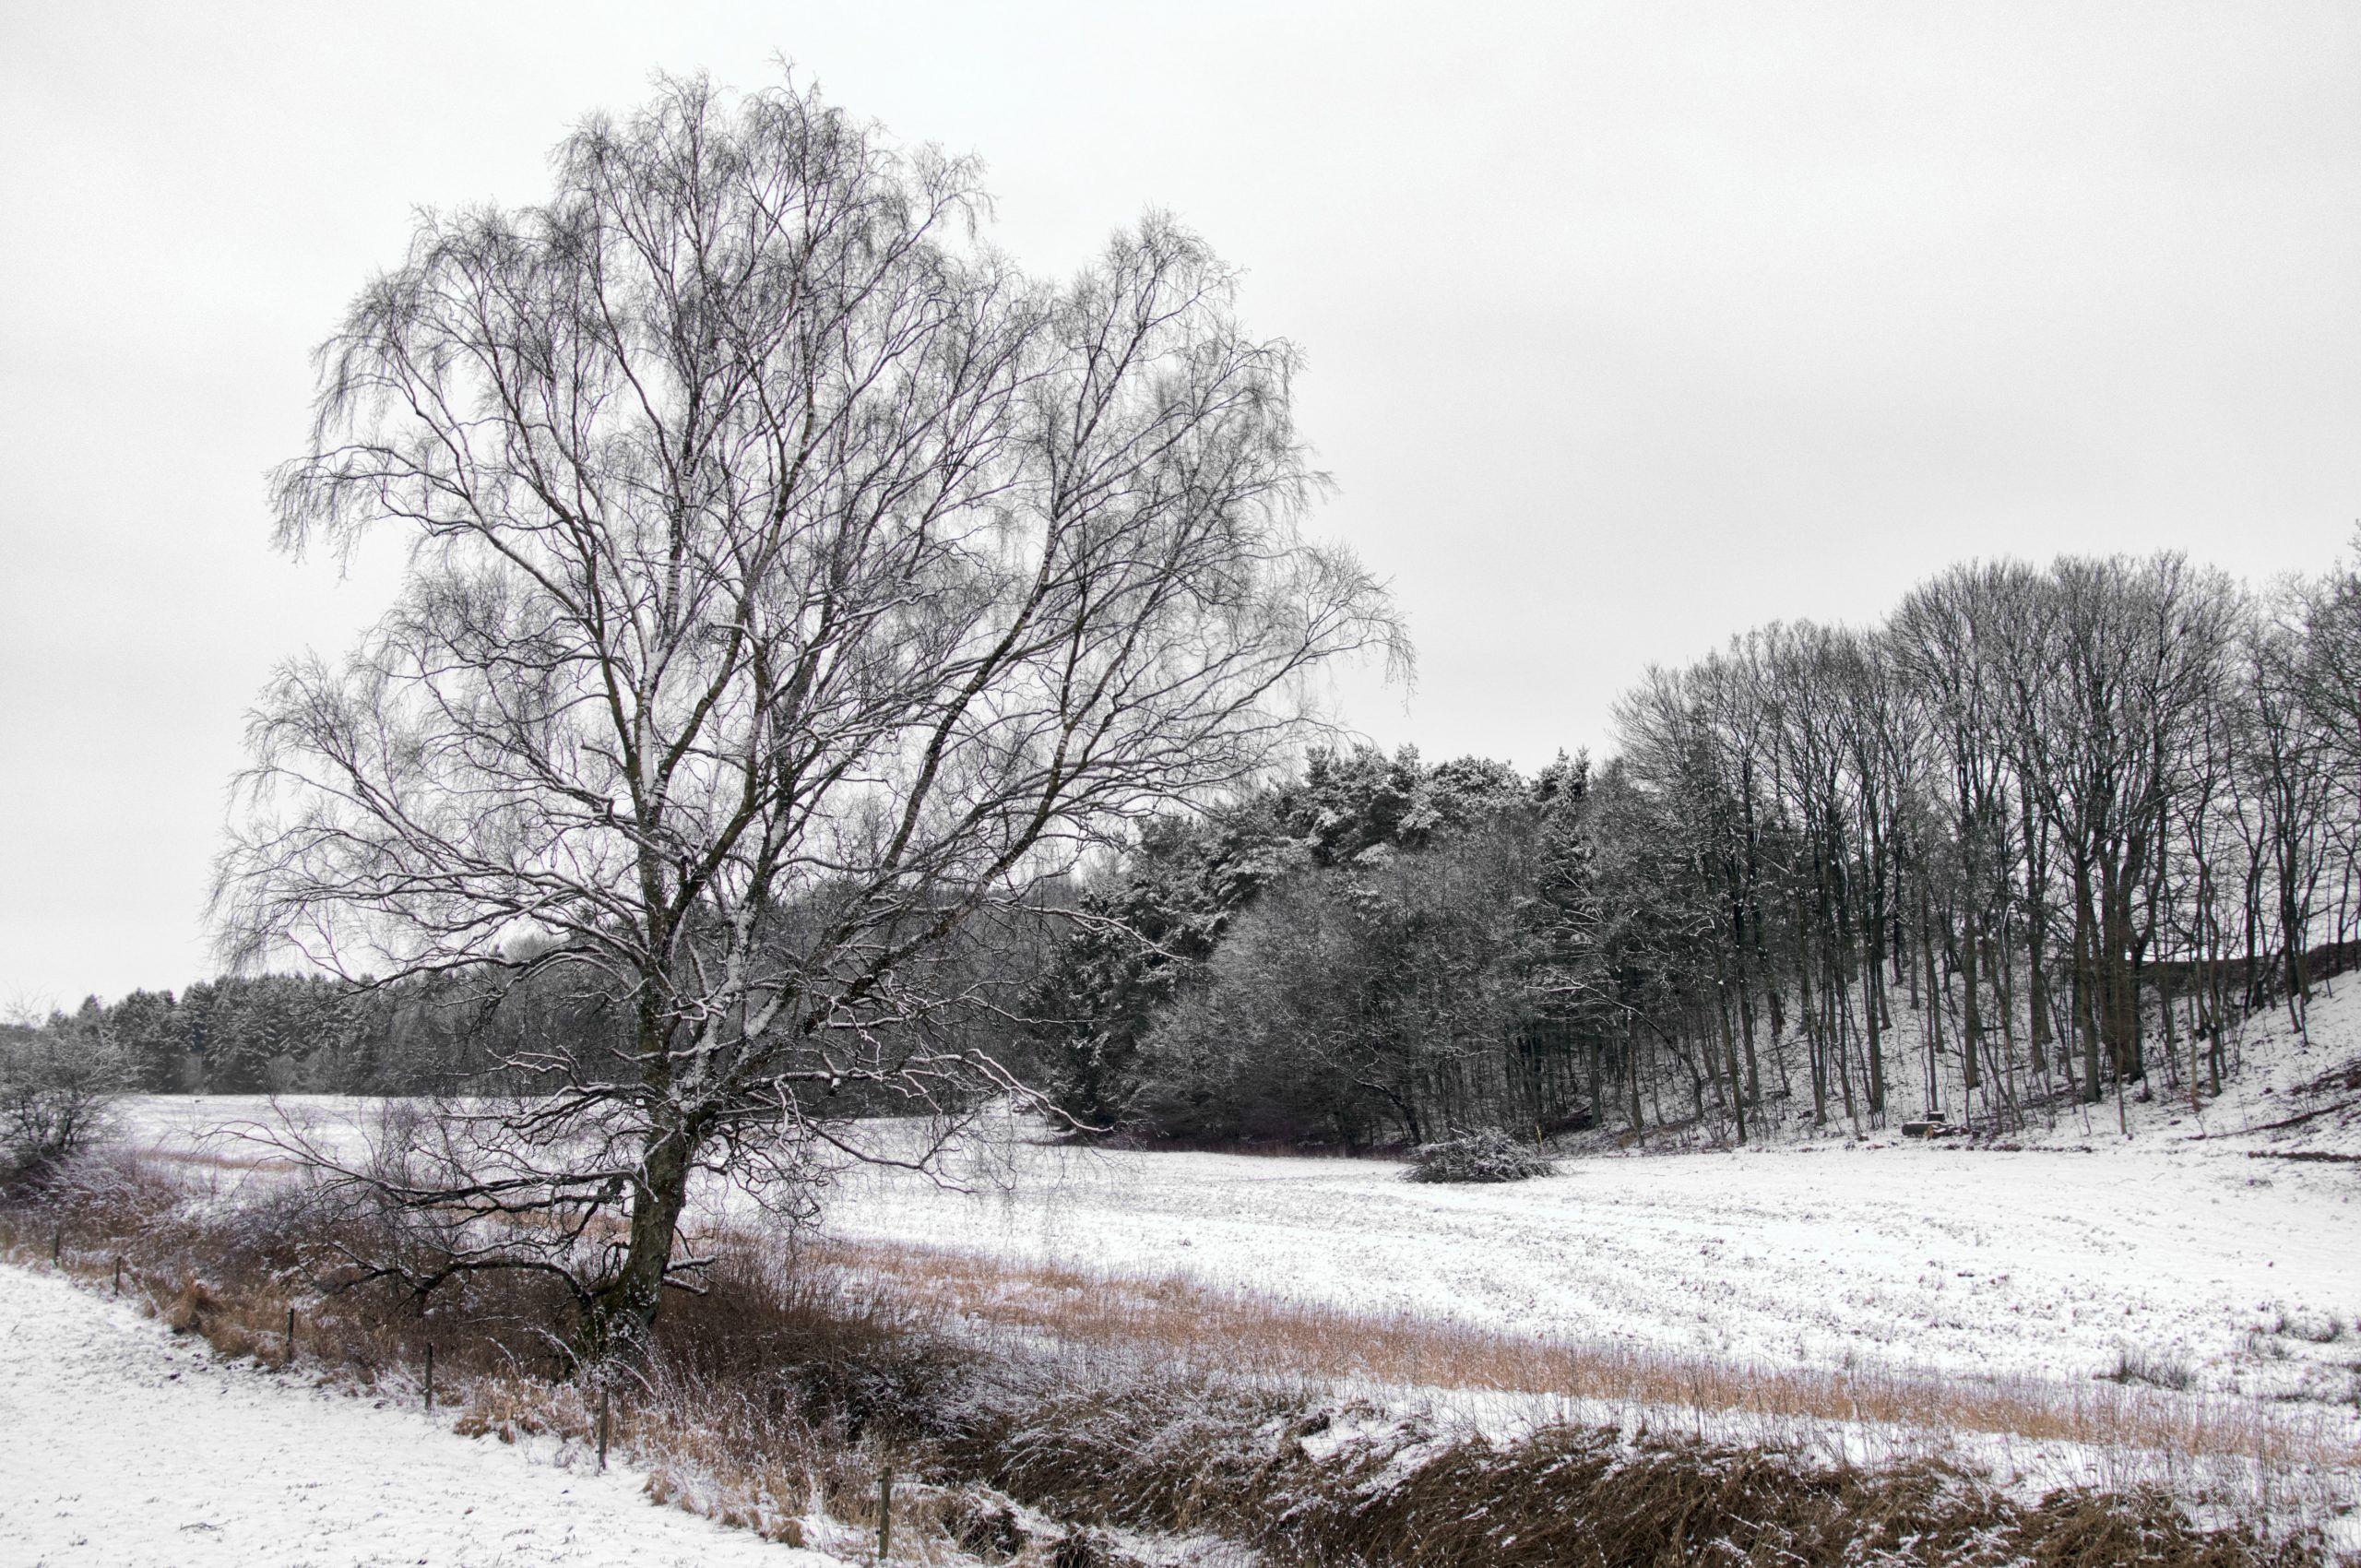 Vintertræ, Fri leg, Uge 10, 68/365, Carlsberg Bækken, Randers